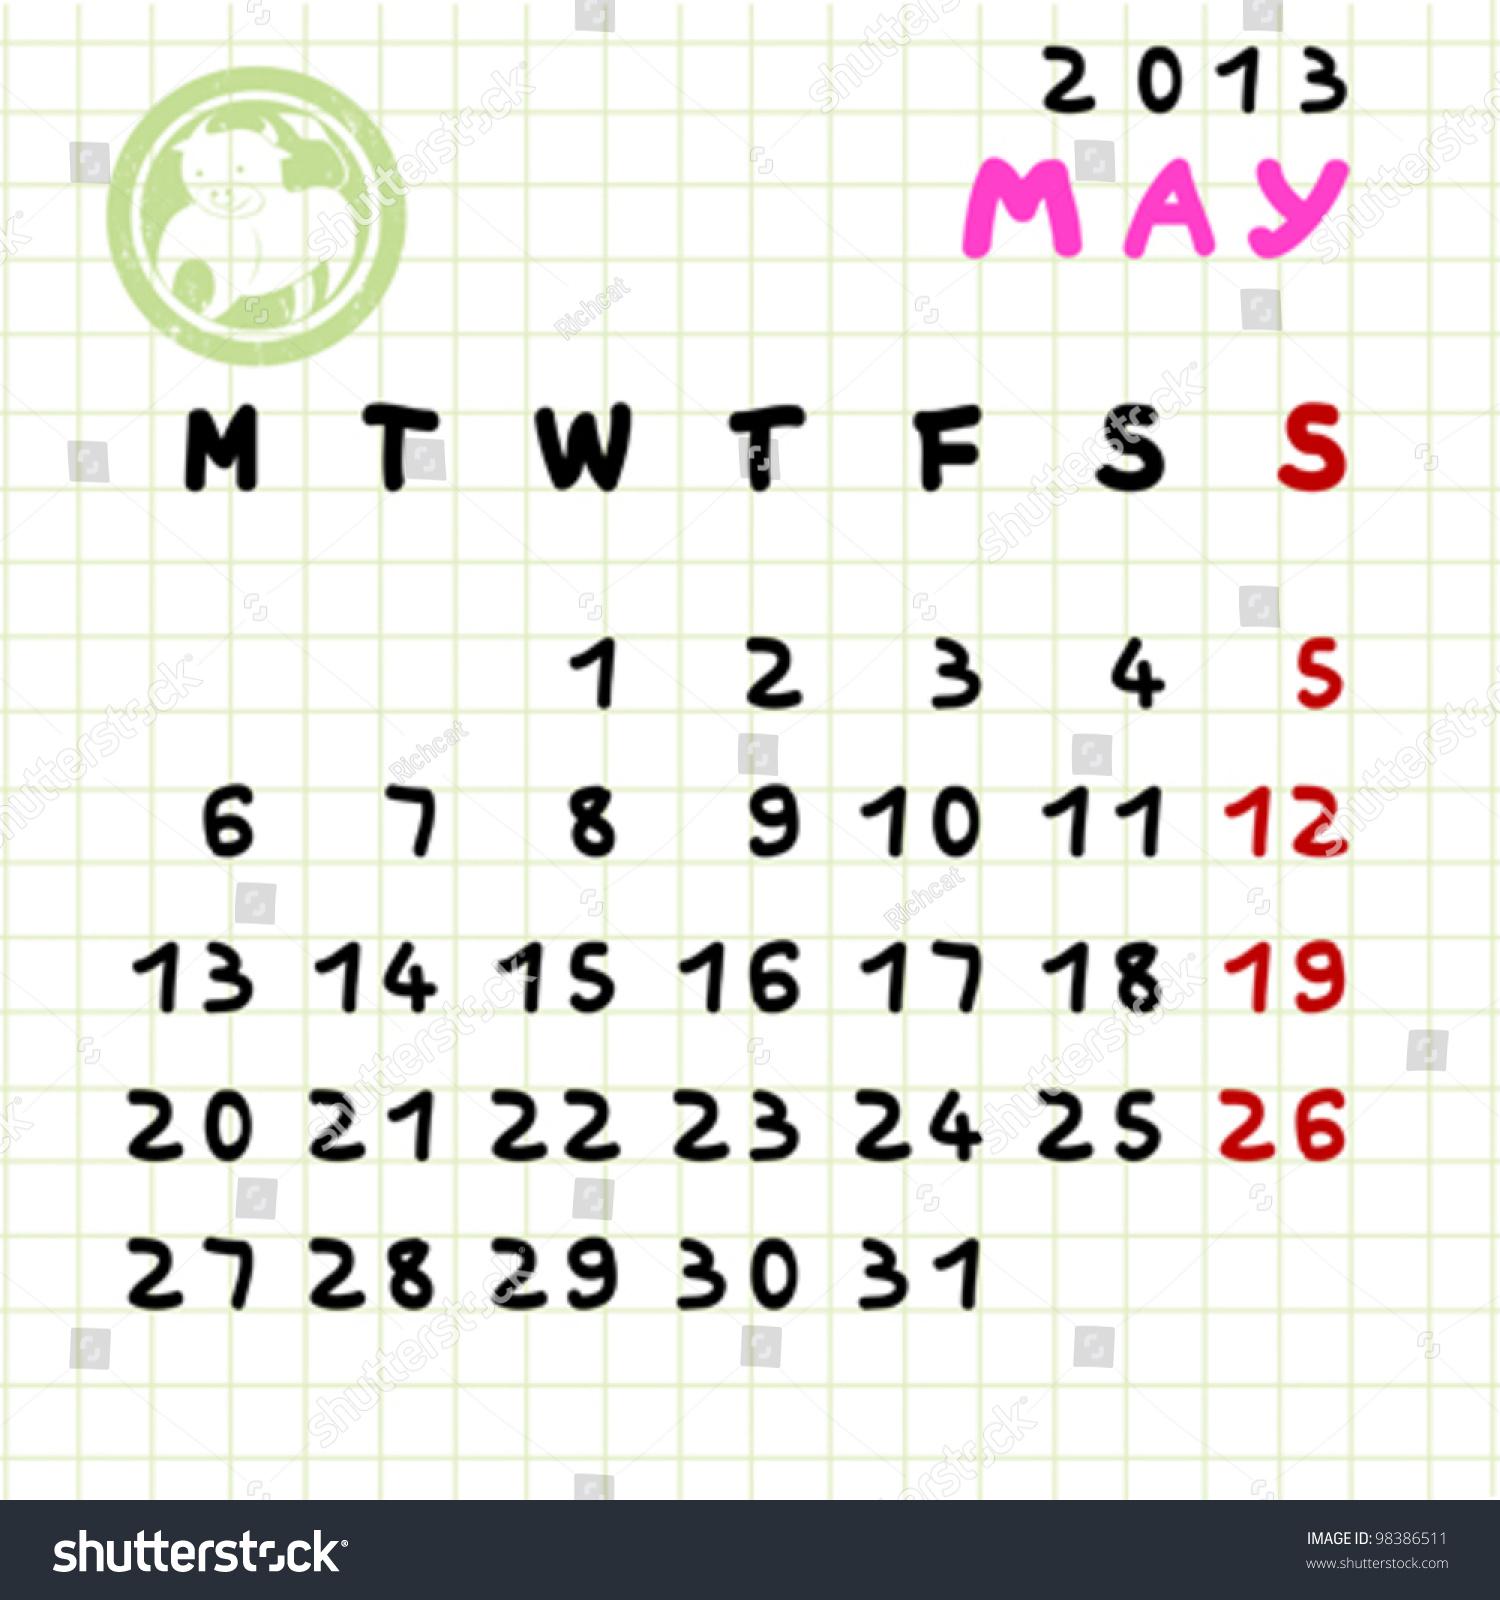 2013 Monthly Calendar May Taurus Zodiac Stock Vector 98386511